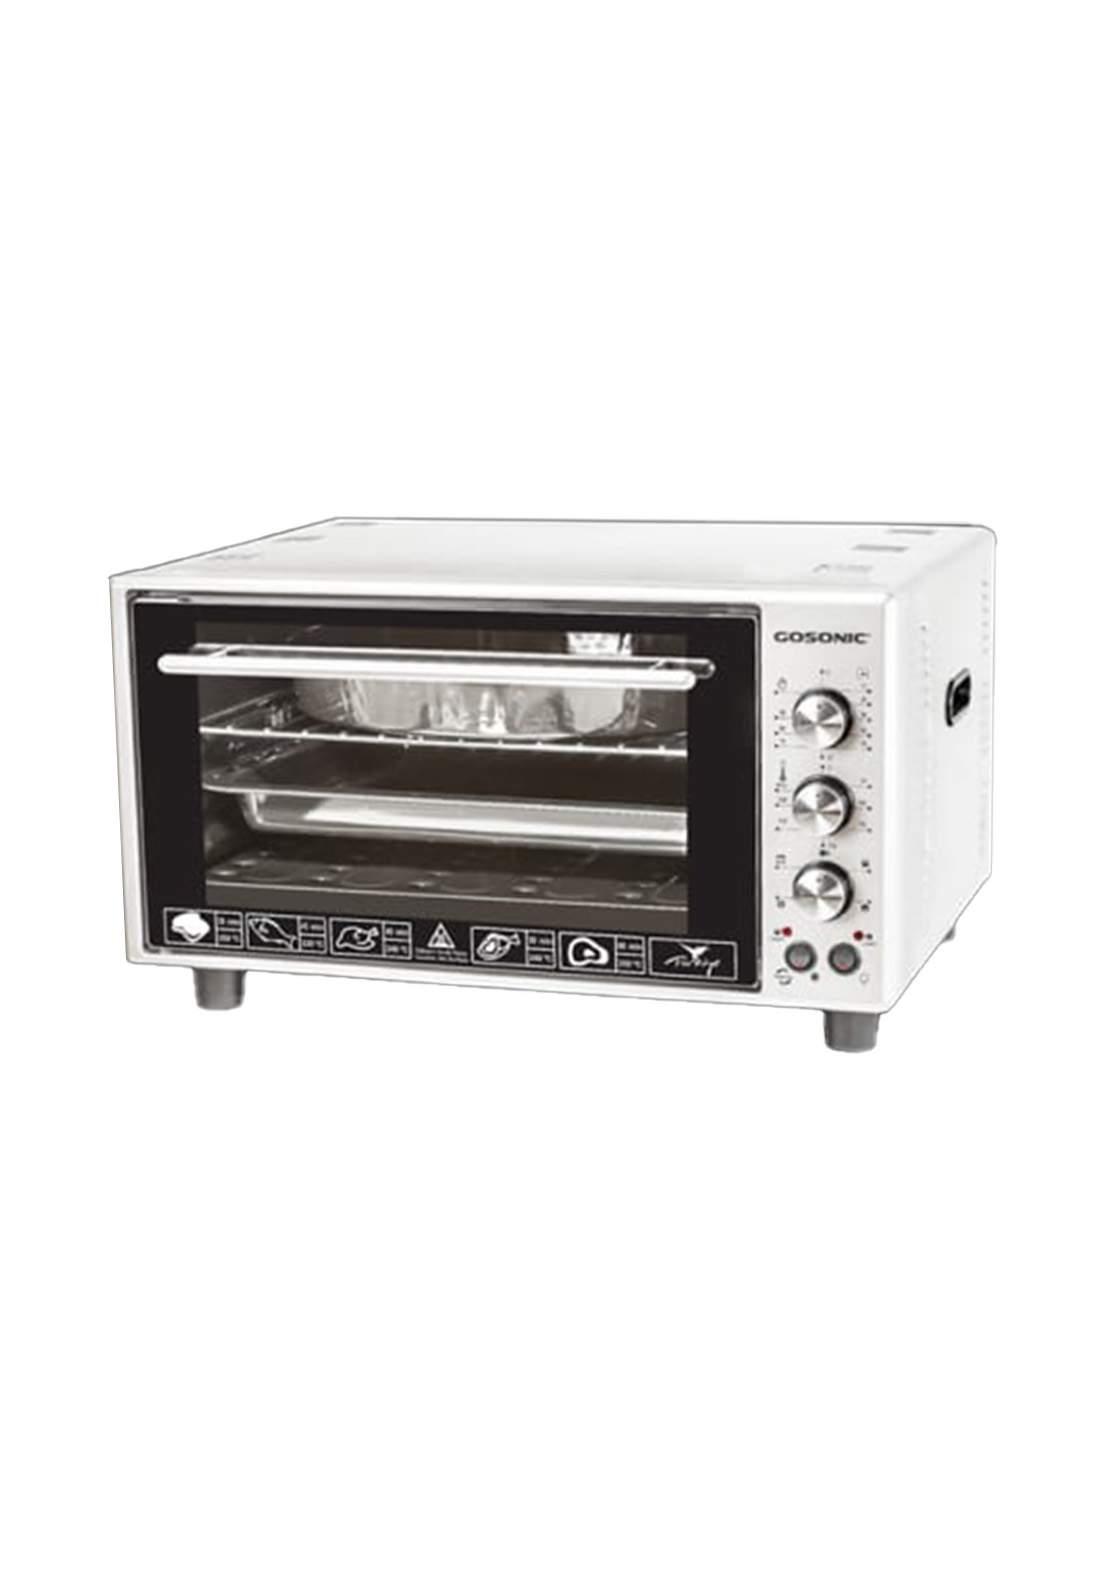 Gosonic geo-660 Electrical  Oven  فرن كهربائي صغير